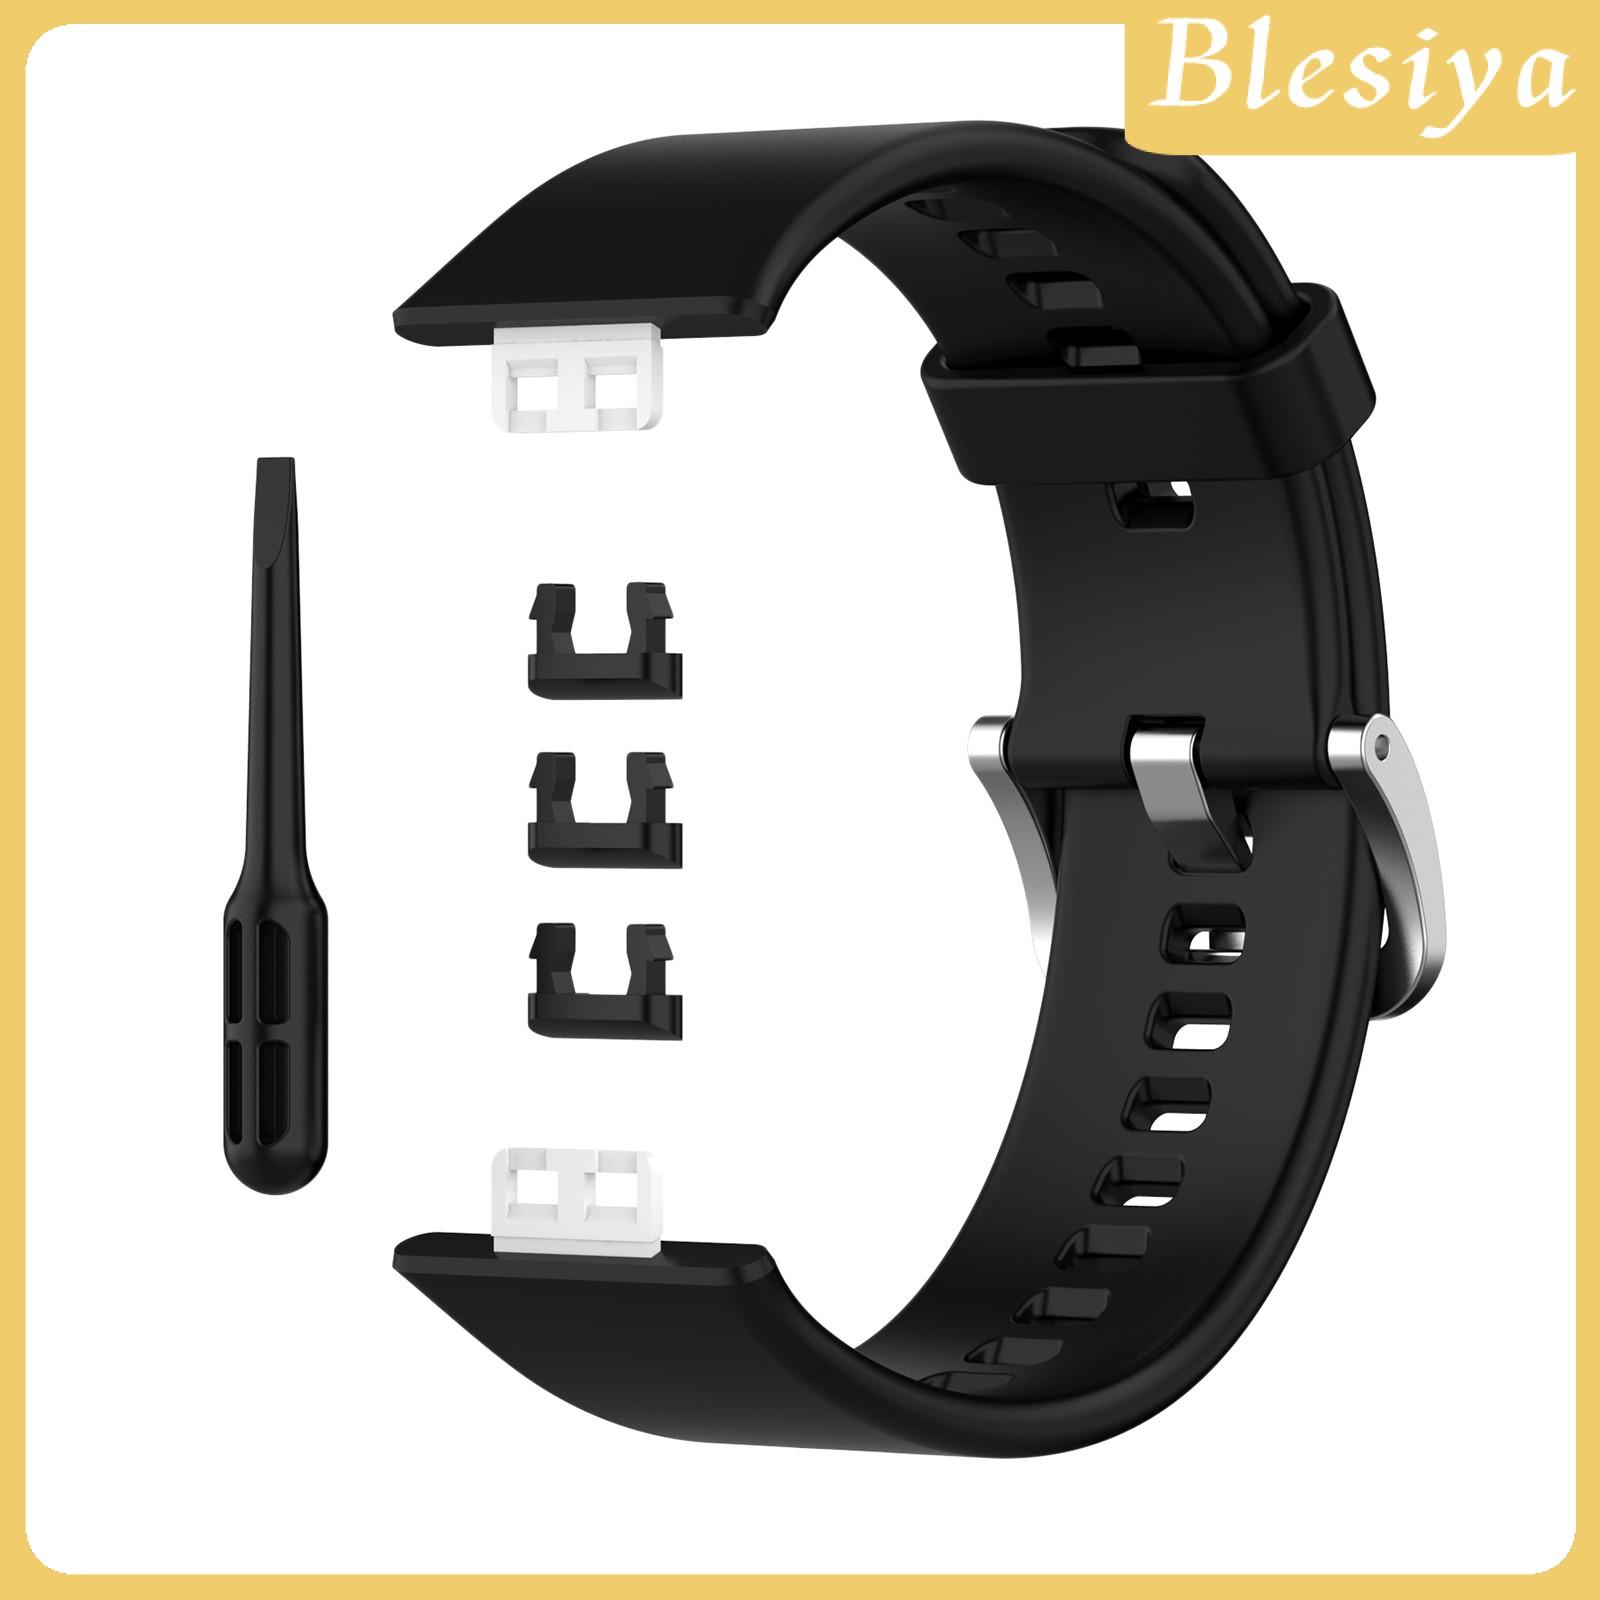 Dây Đeo Silicon Mềm Cho Đồng Hồ Huawei Watch Fit Ia-B09 Ia-B19